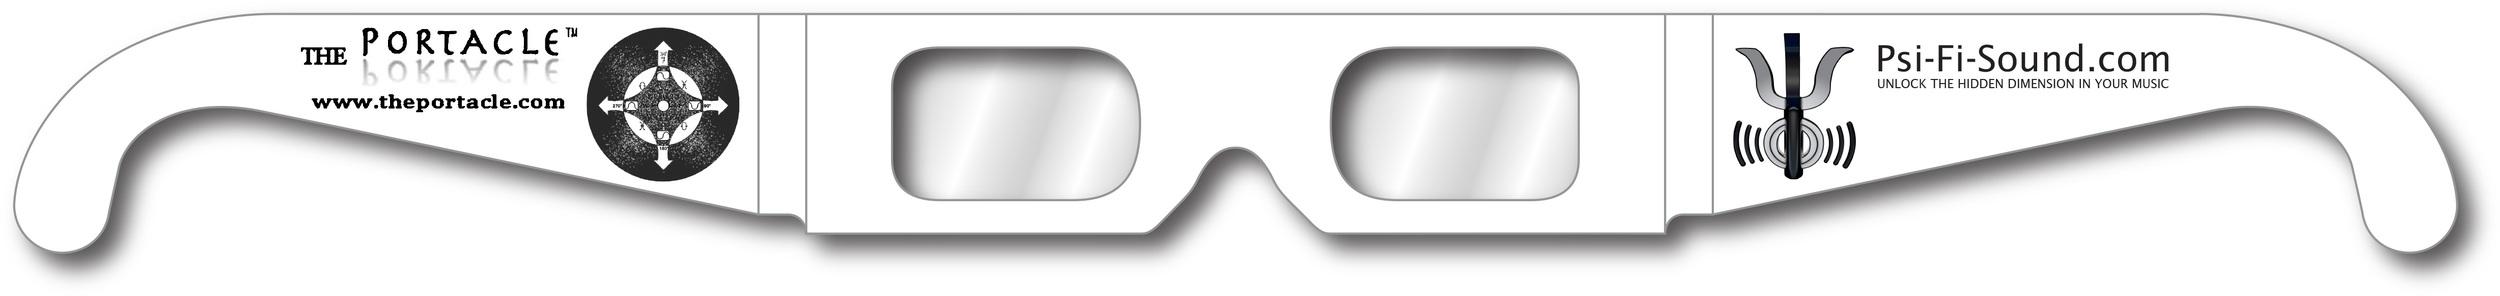 PortaclePsiFiGlasses.jpg